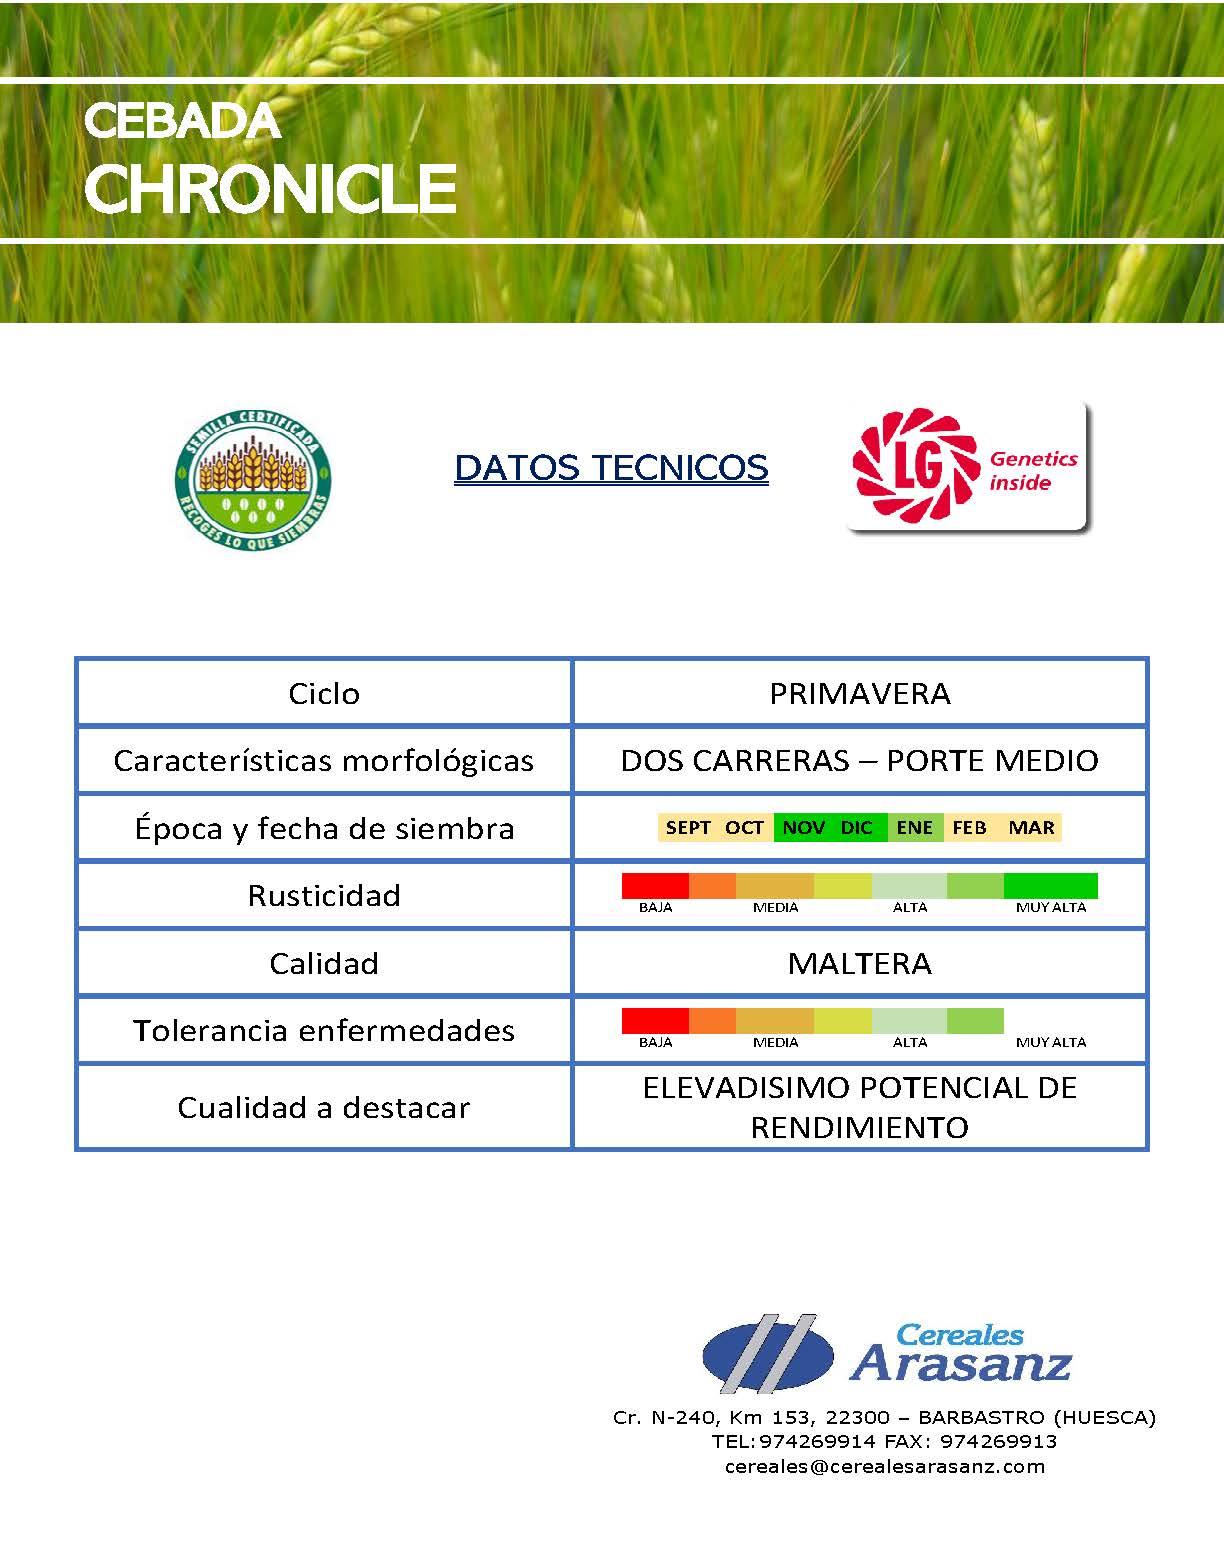 Cebada Chronicle